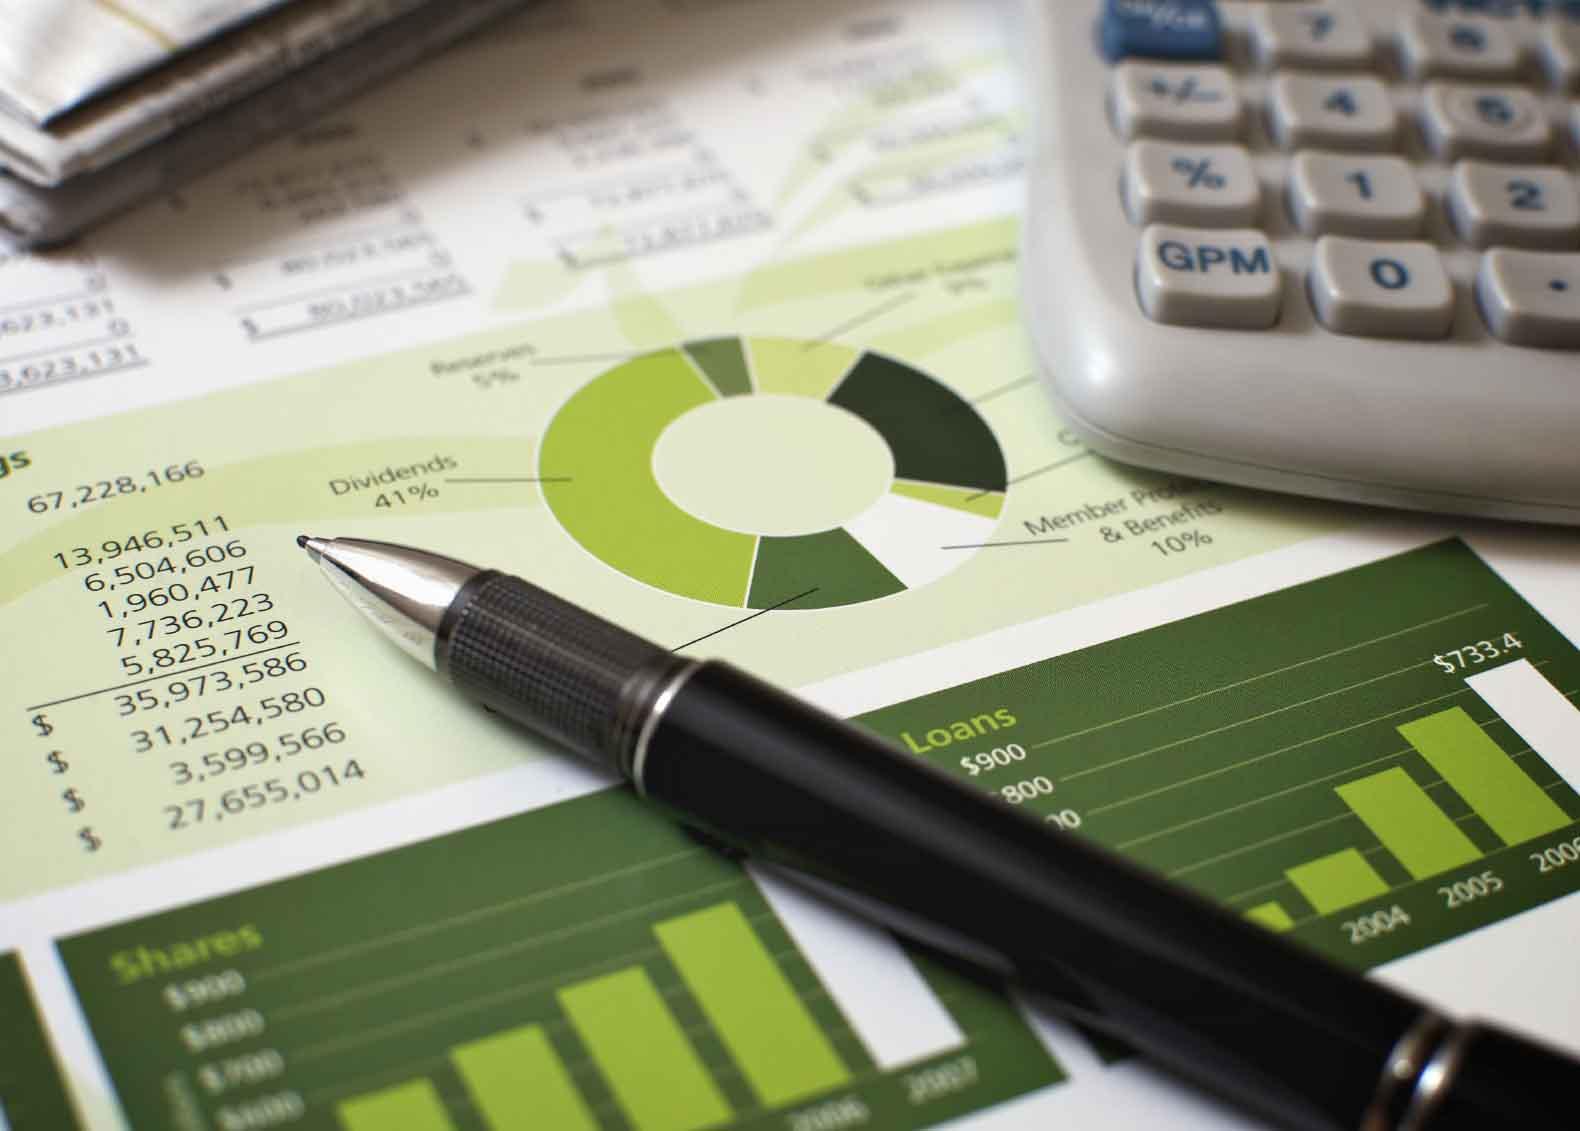 Long Giang Land tuyển dụng Kế toán